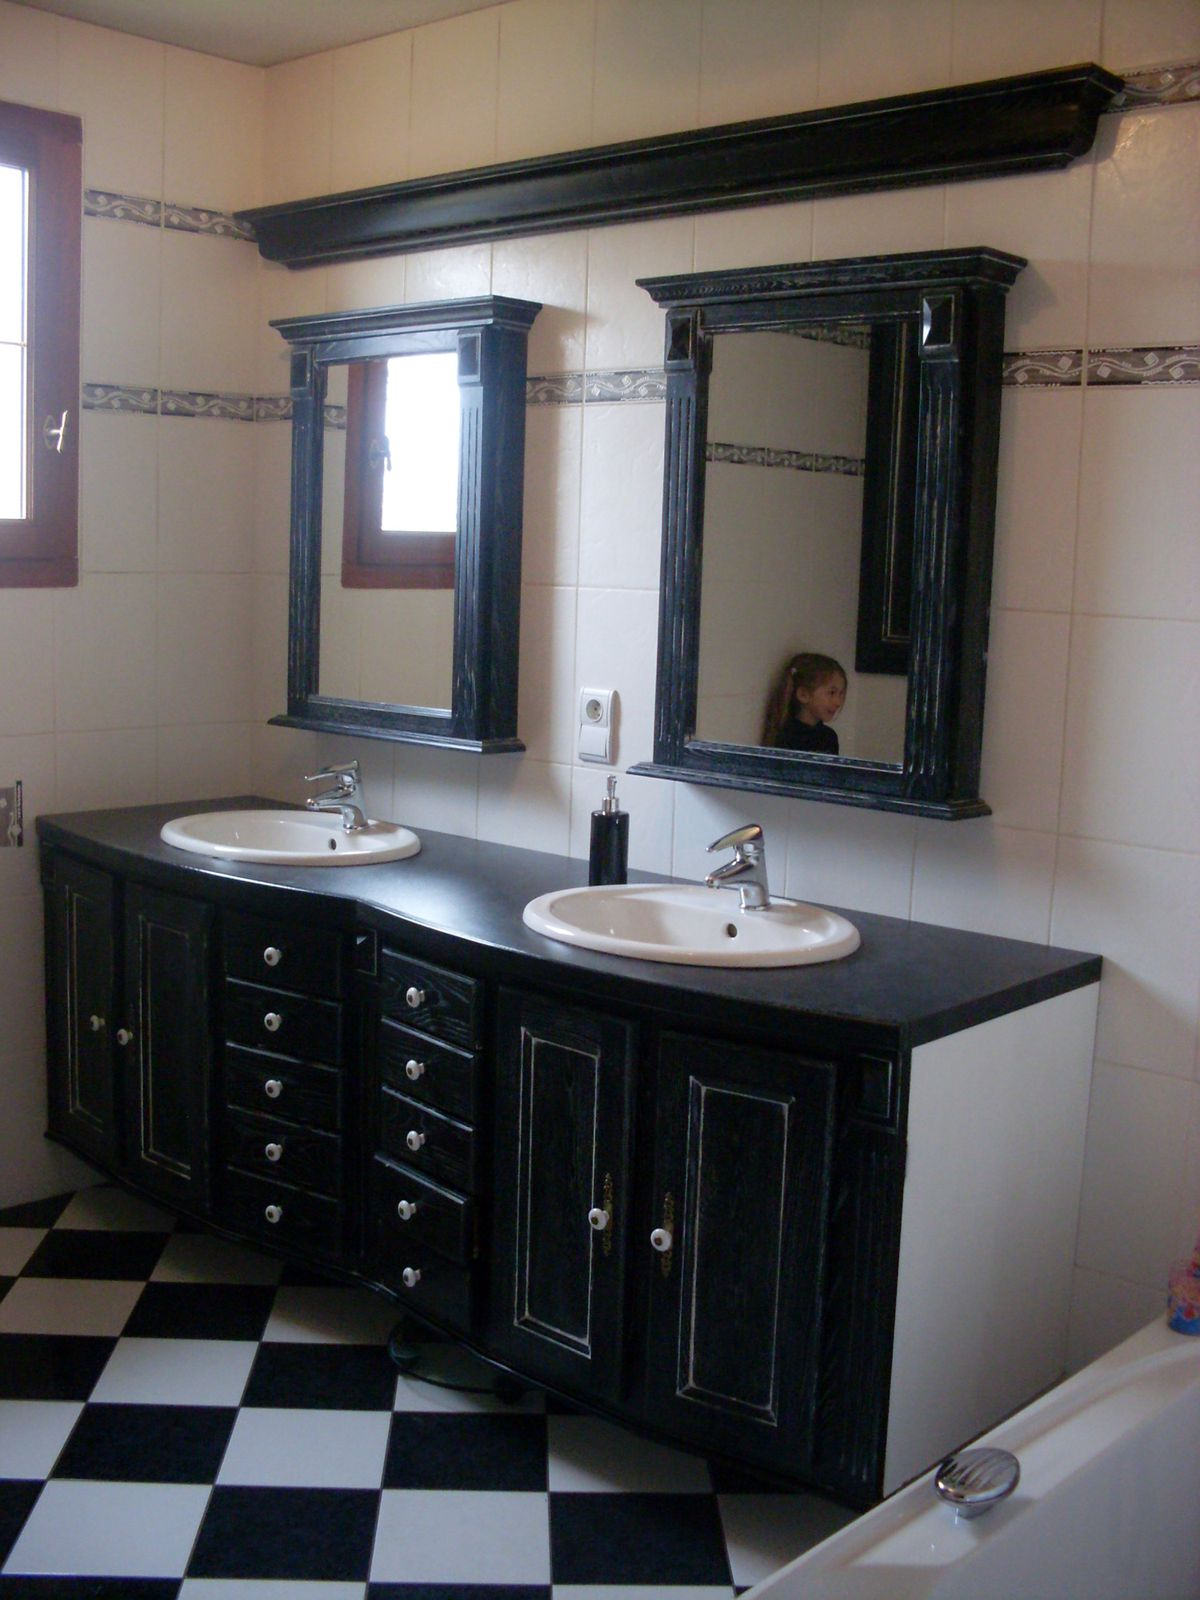 Salle de bain ma menuiserie - Configurateur salle de bain ...